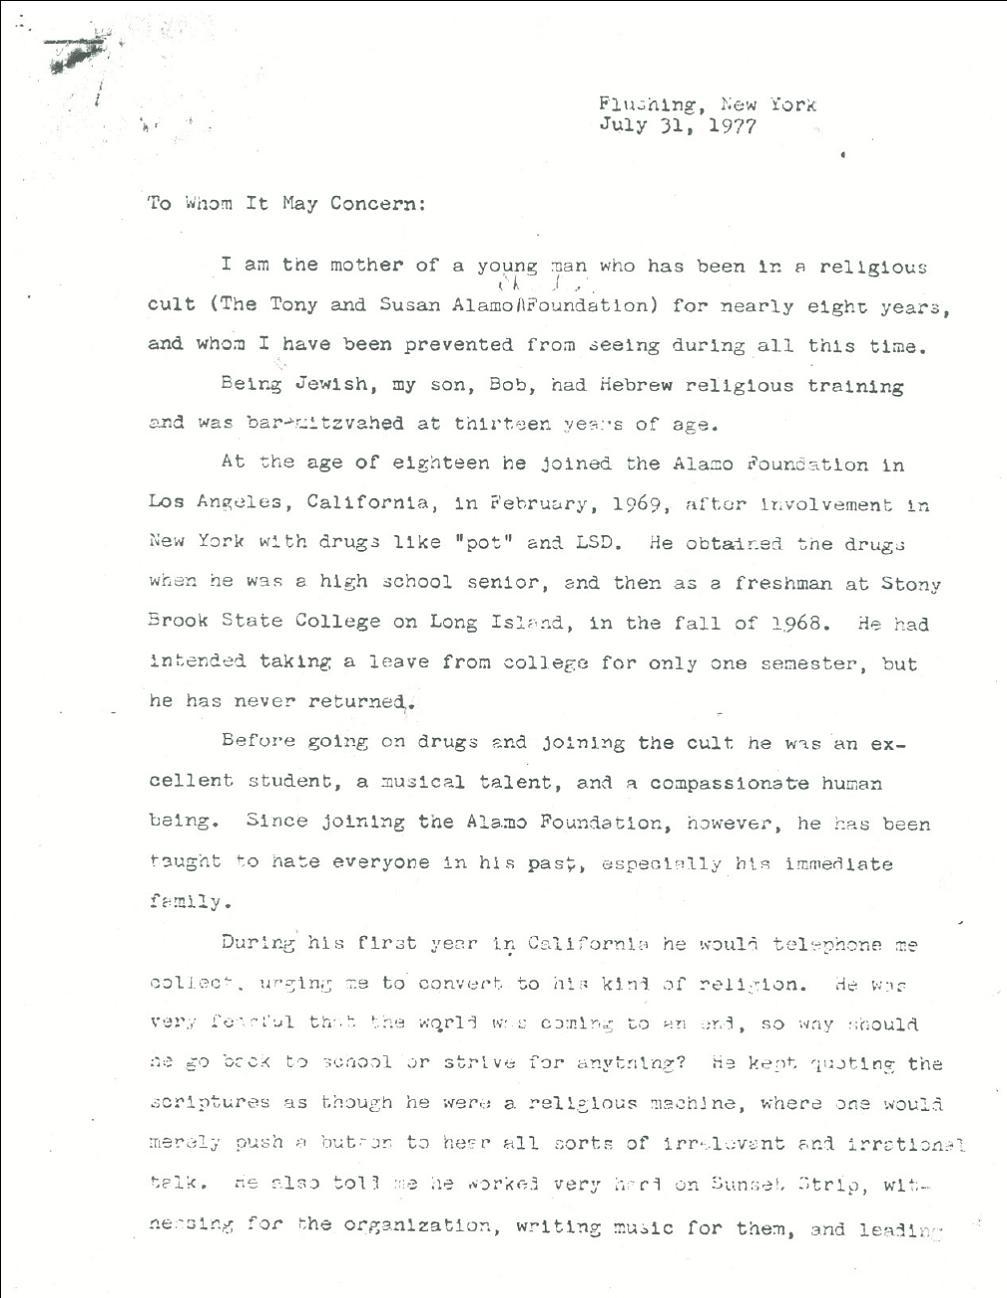 Tony Alamo News  Blog Archive  Ida K s Letter About Her Son Bob